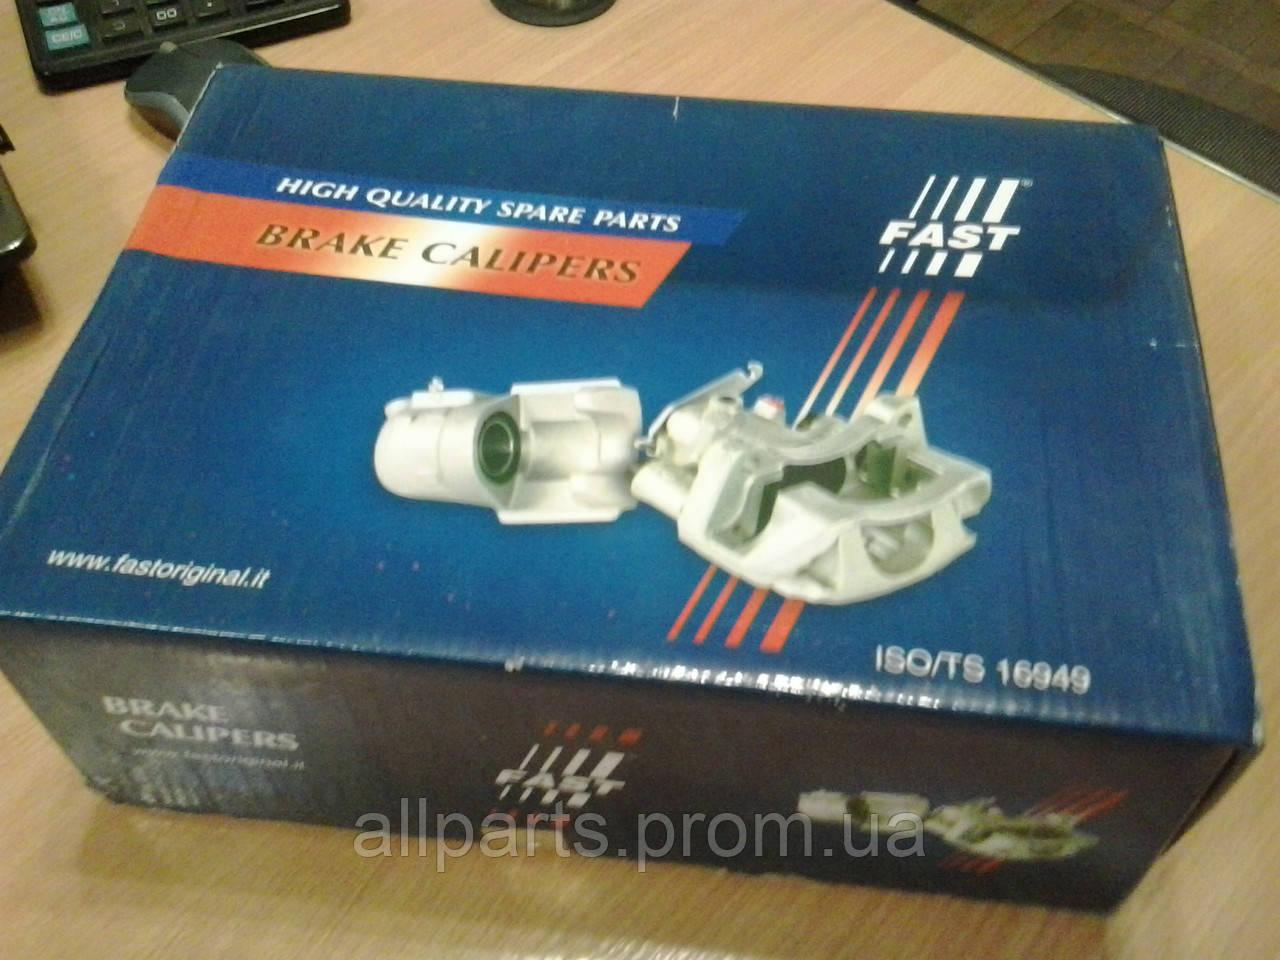 Тормозной суппорт колеса Fast (производство Италия)